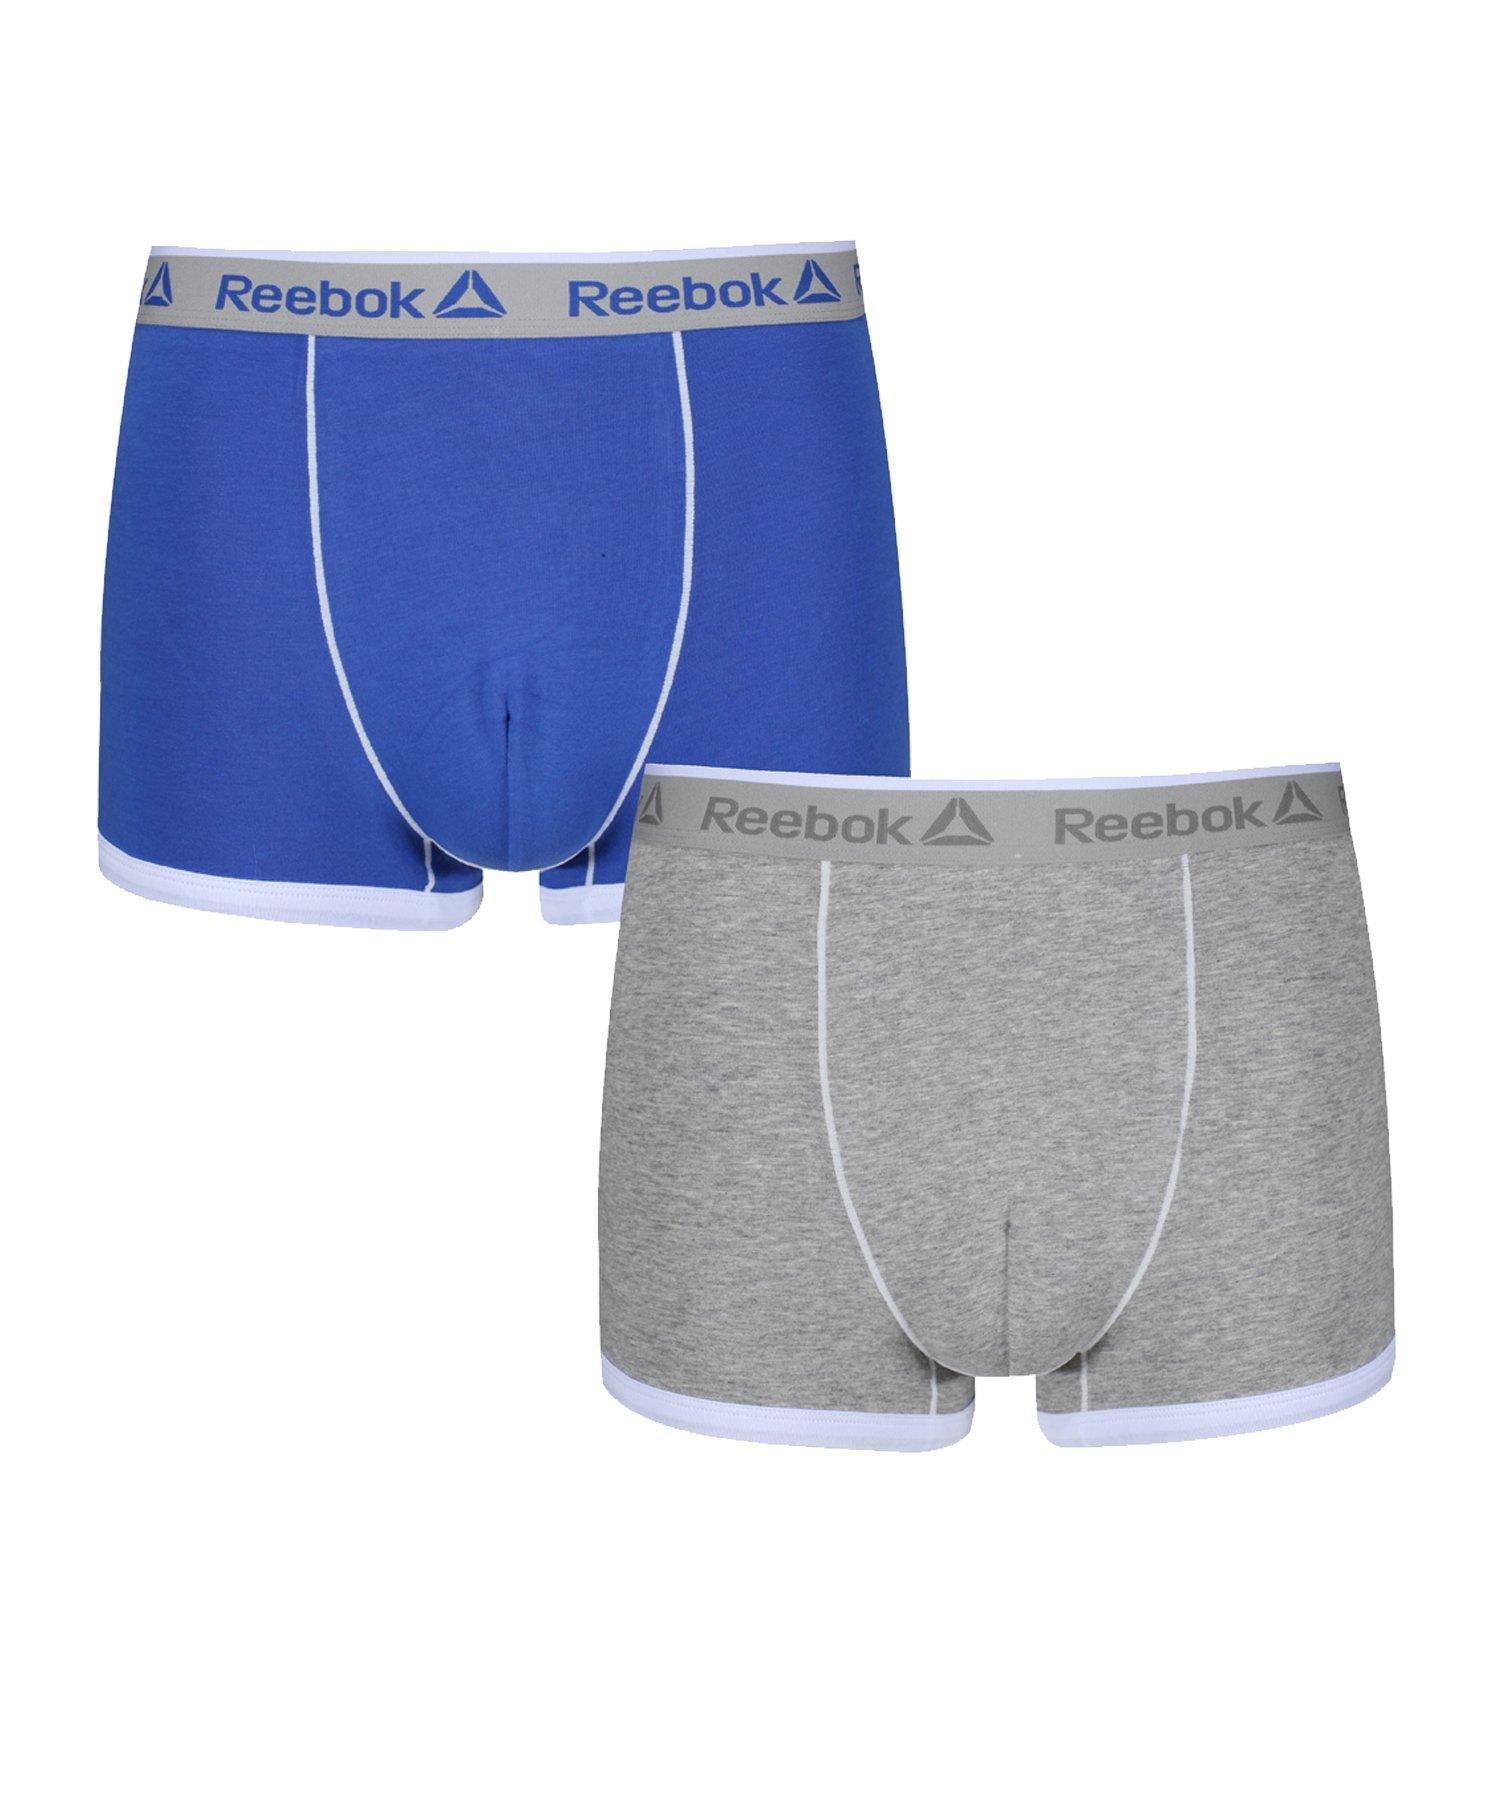 Reebok 2er Pack Trunk OLIVER BoxershortBlau & Grau - blau